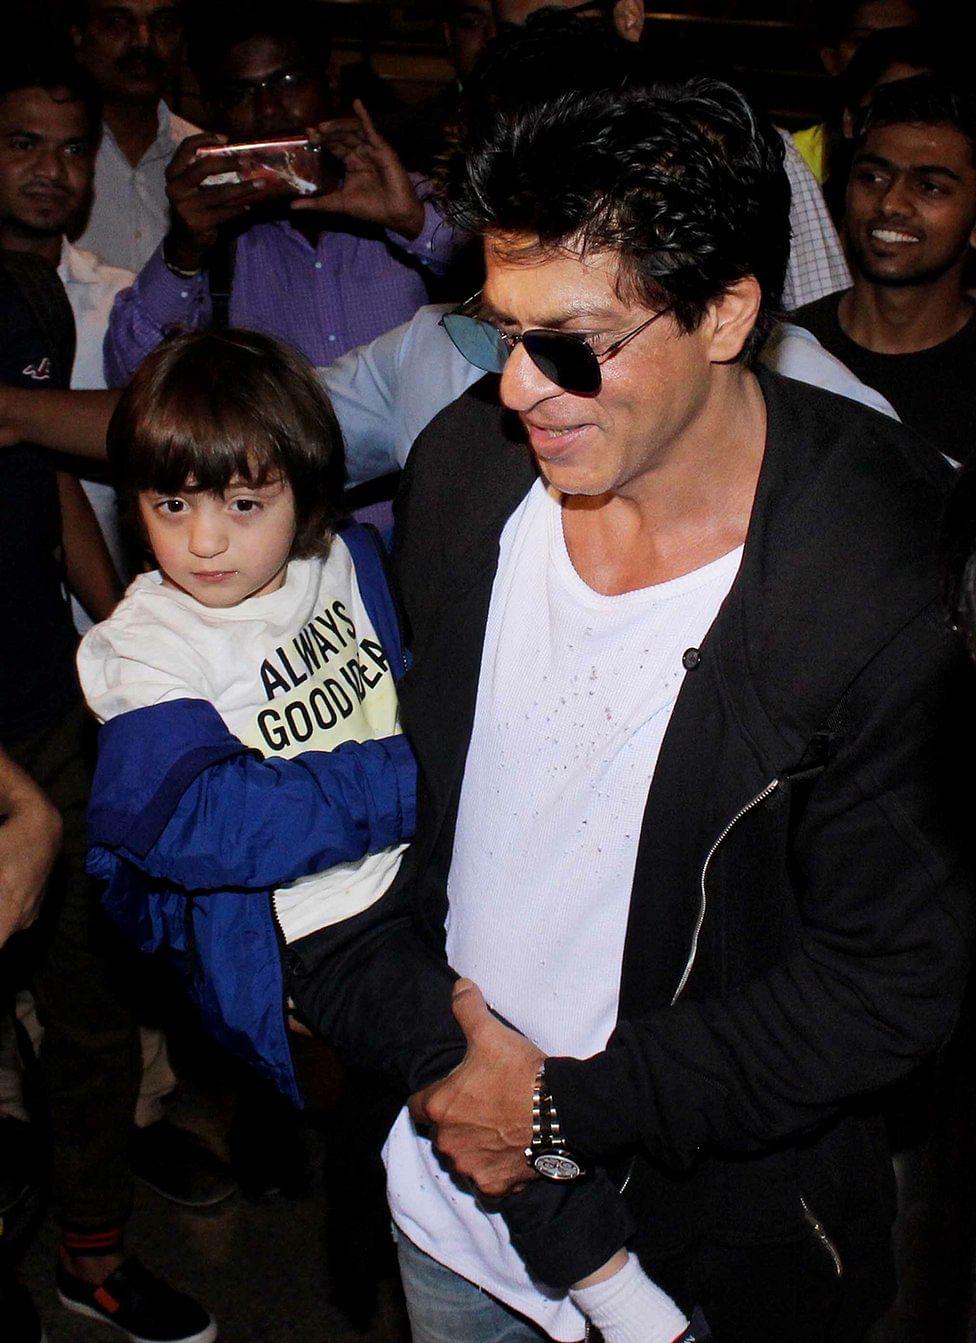 Shah Rukh Khan with his son Abram. (Photo: Yogen Shah)